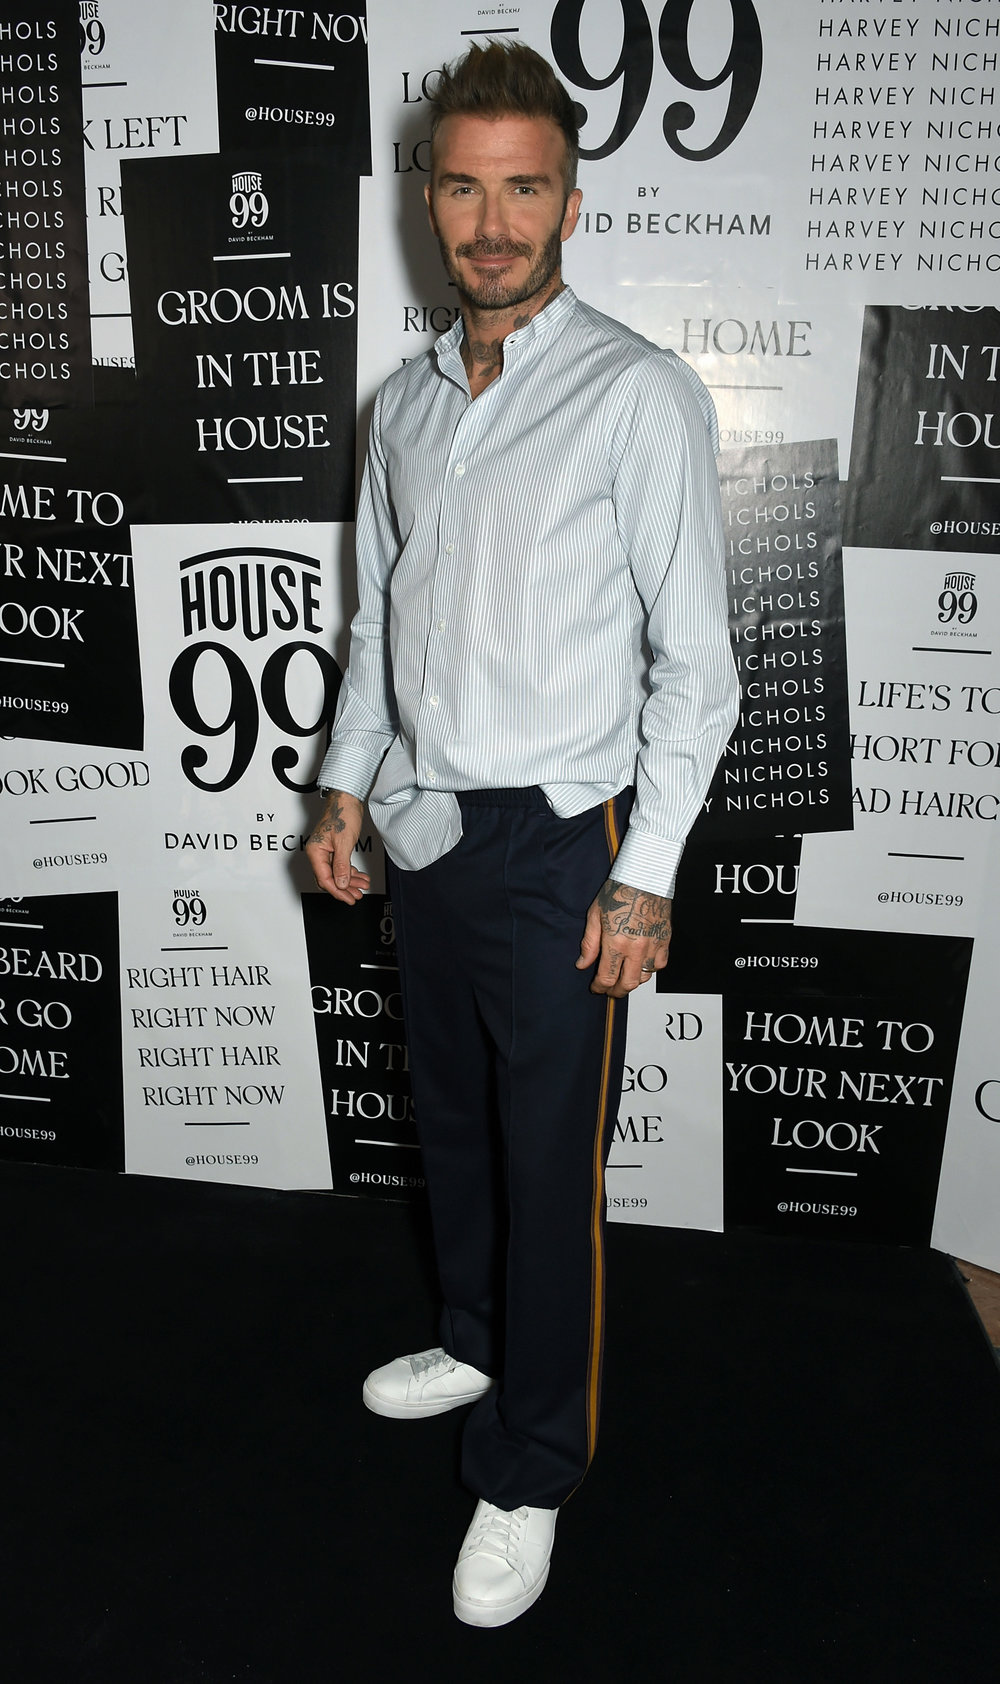 DMB-House 99 brand launch at Harvey Nichols01.JPG